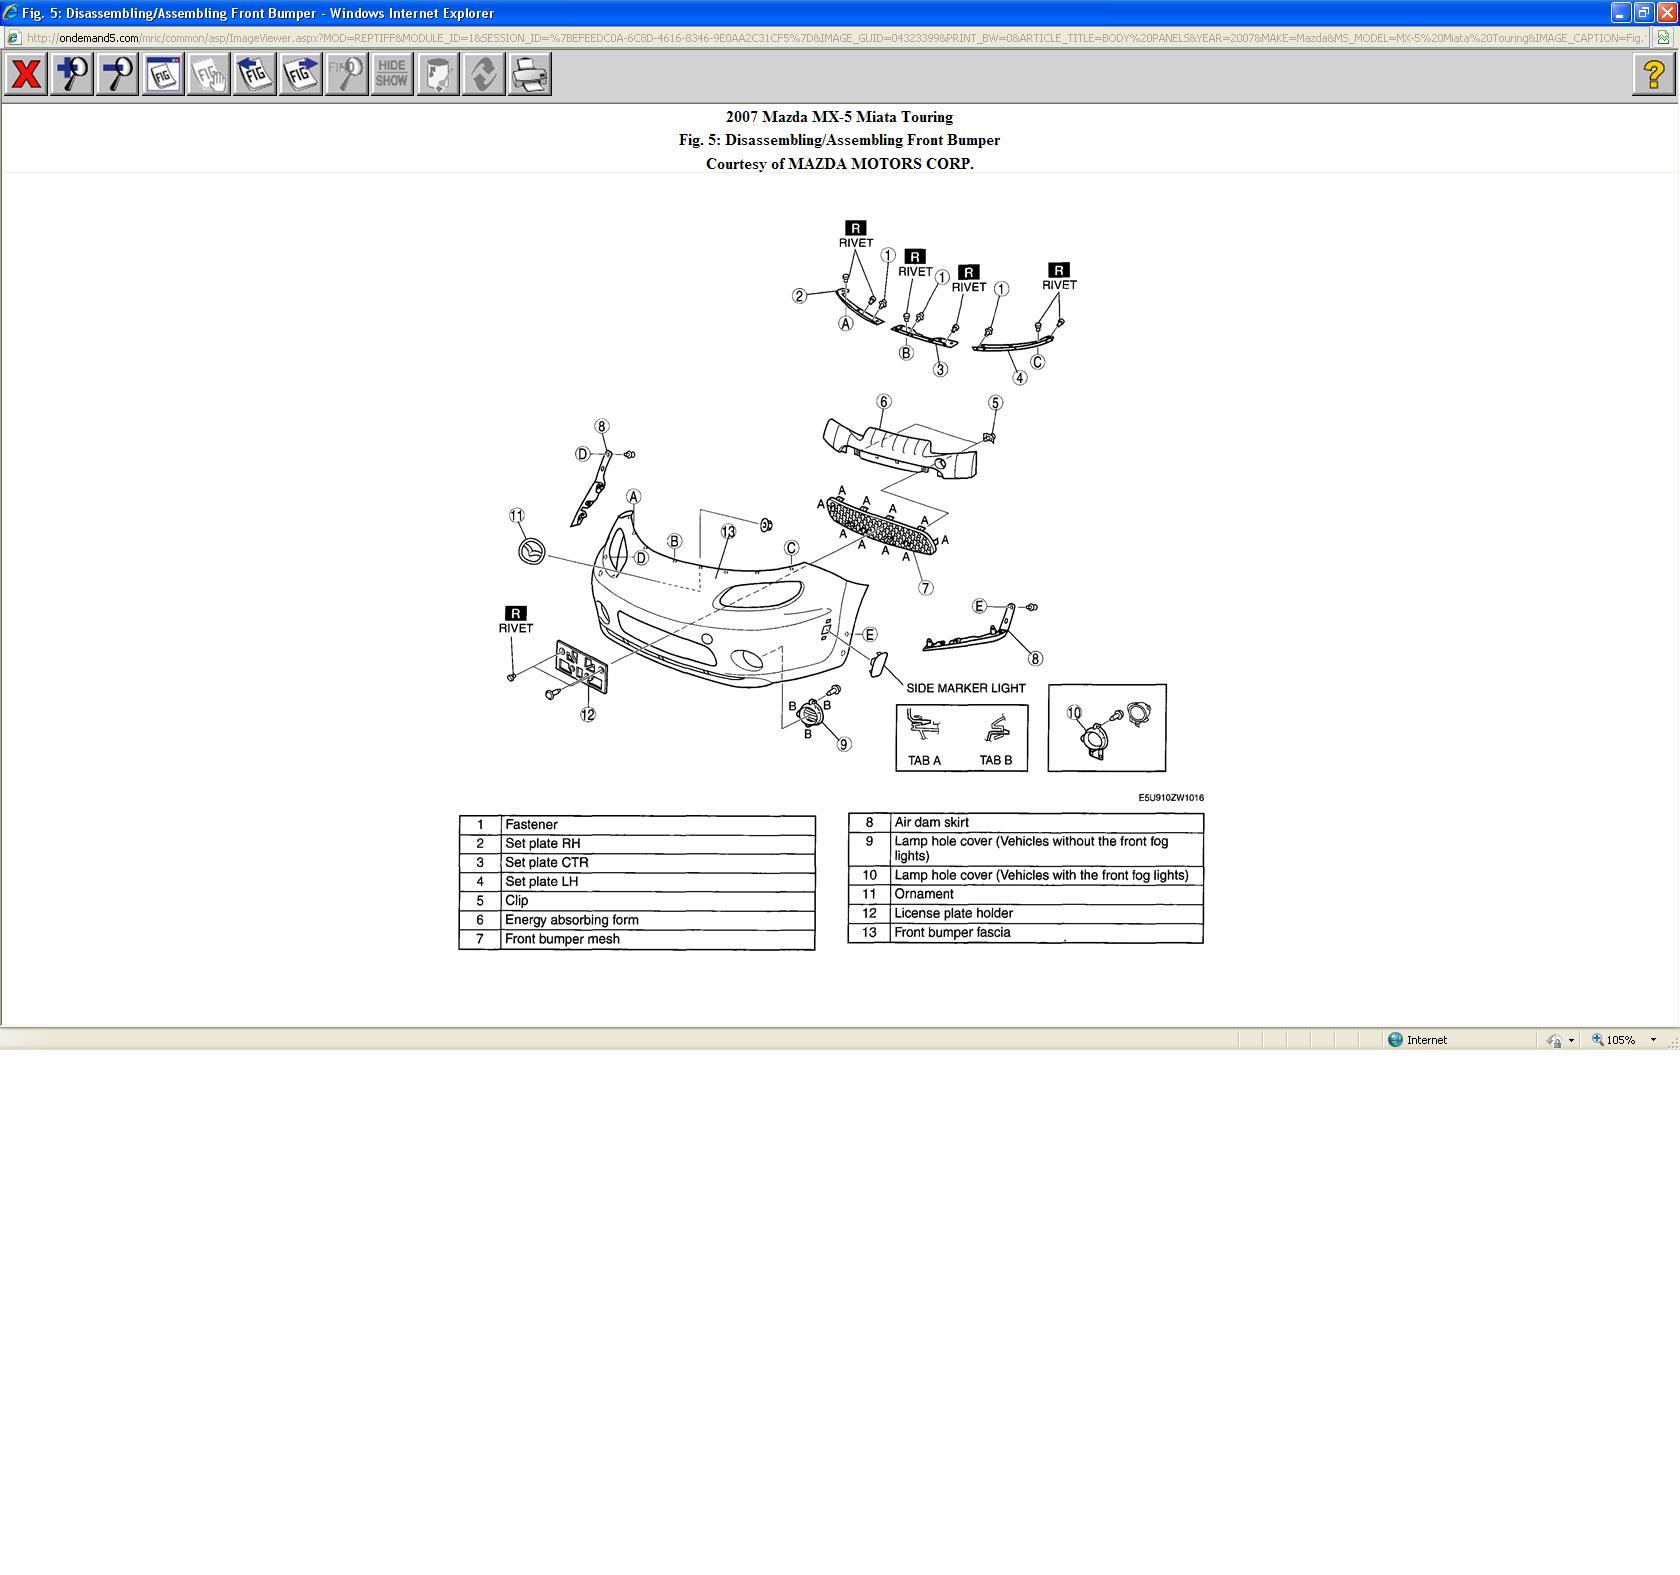 2006 Mazda 5 Service Manual Iet Wiring Regulations Book 17th Edition Amendment 1 Pdf Array Rh Cityasplatform